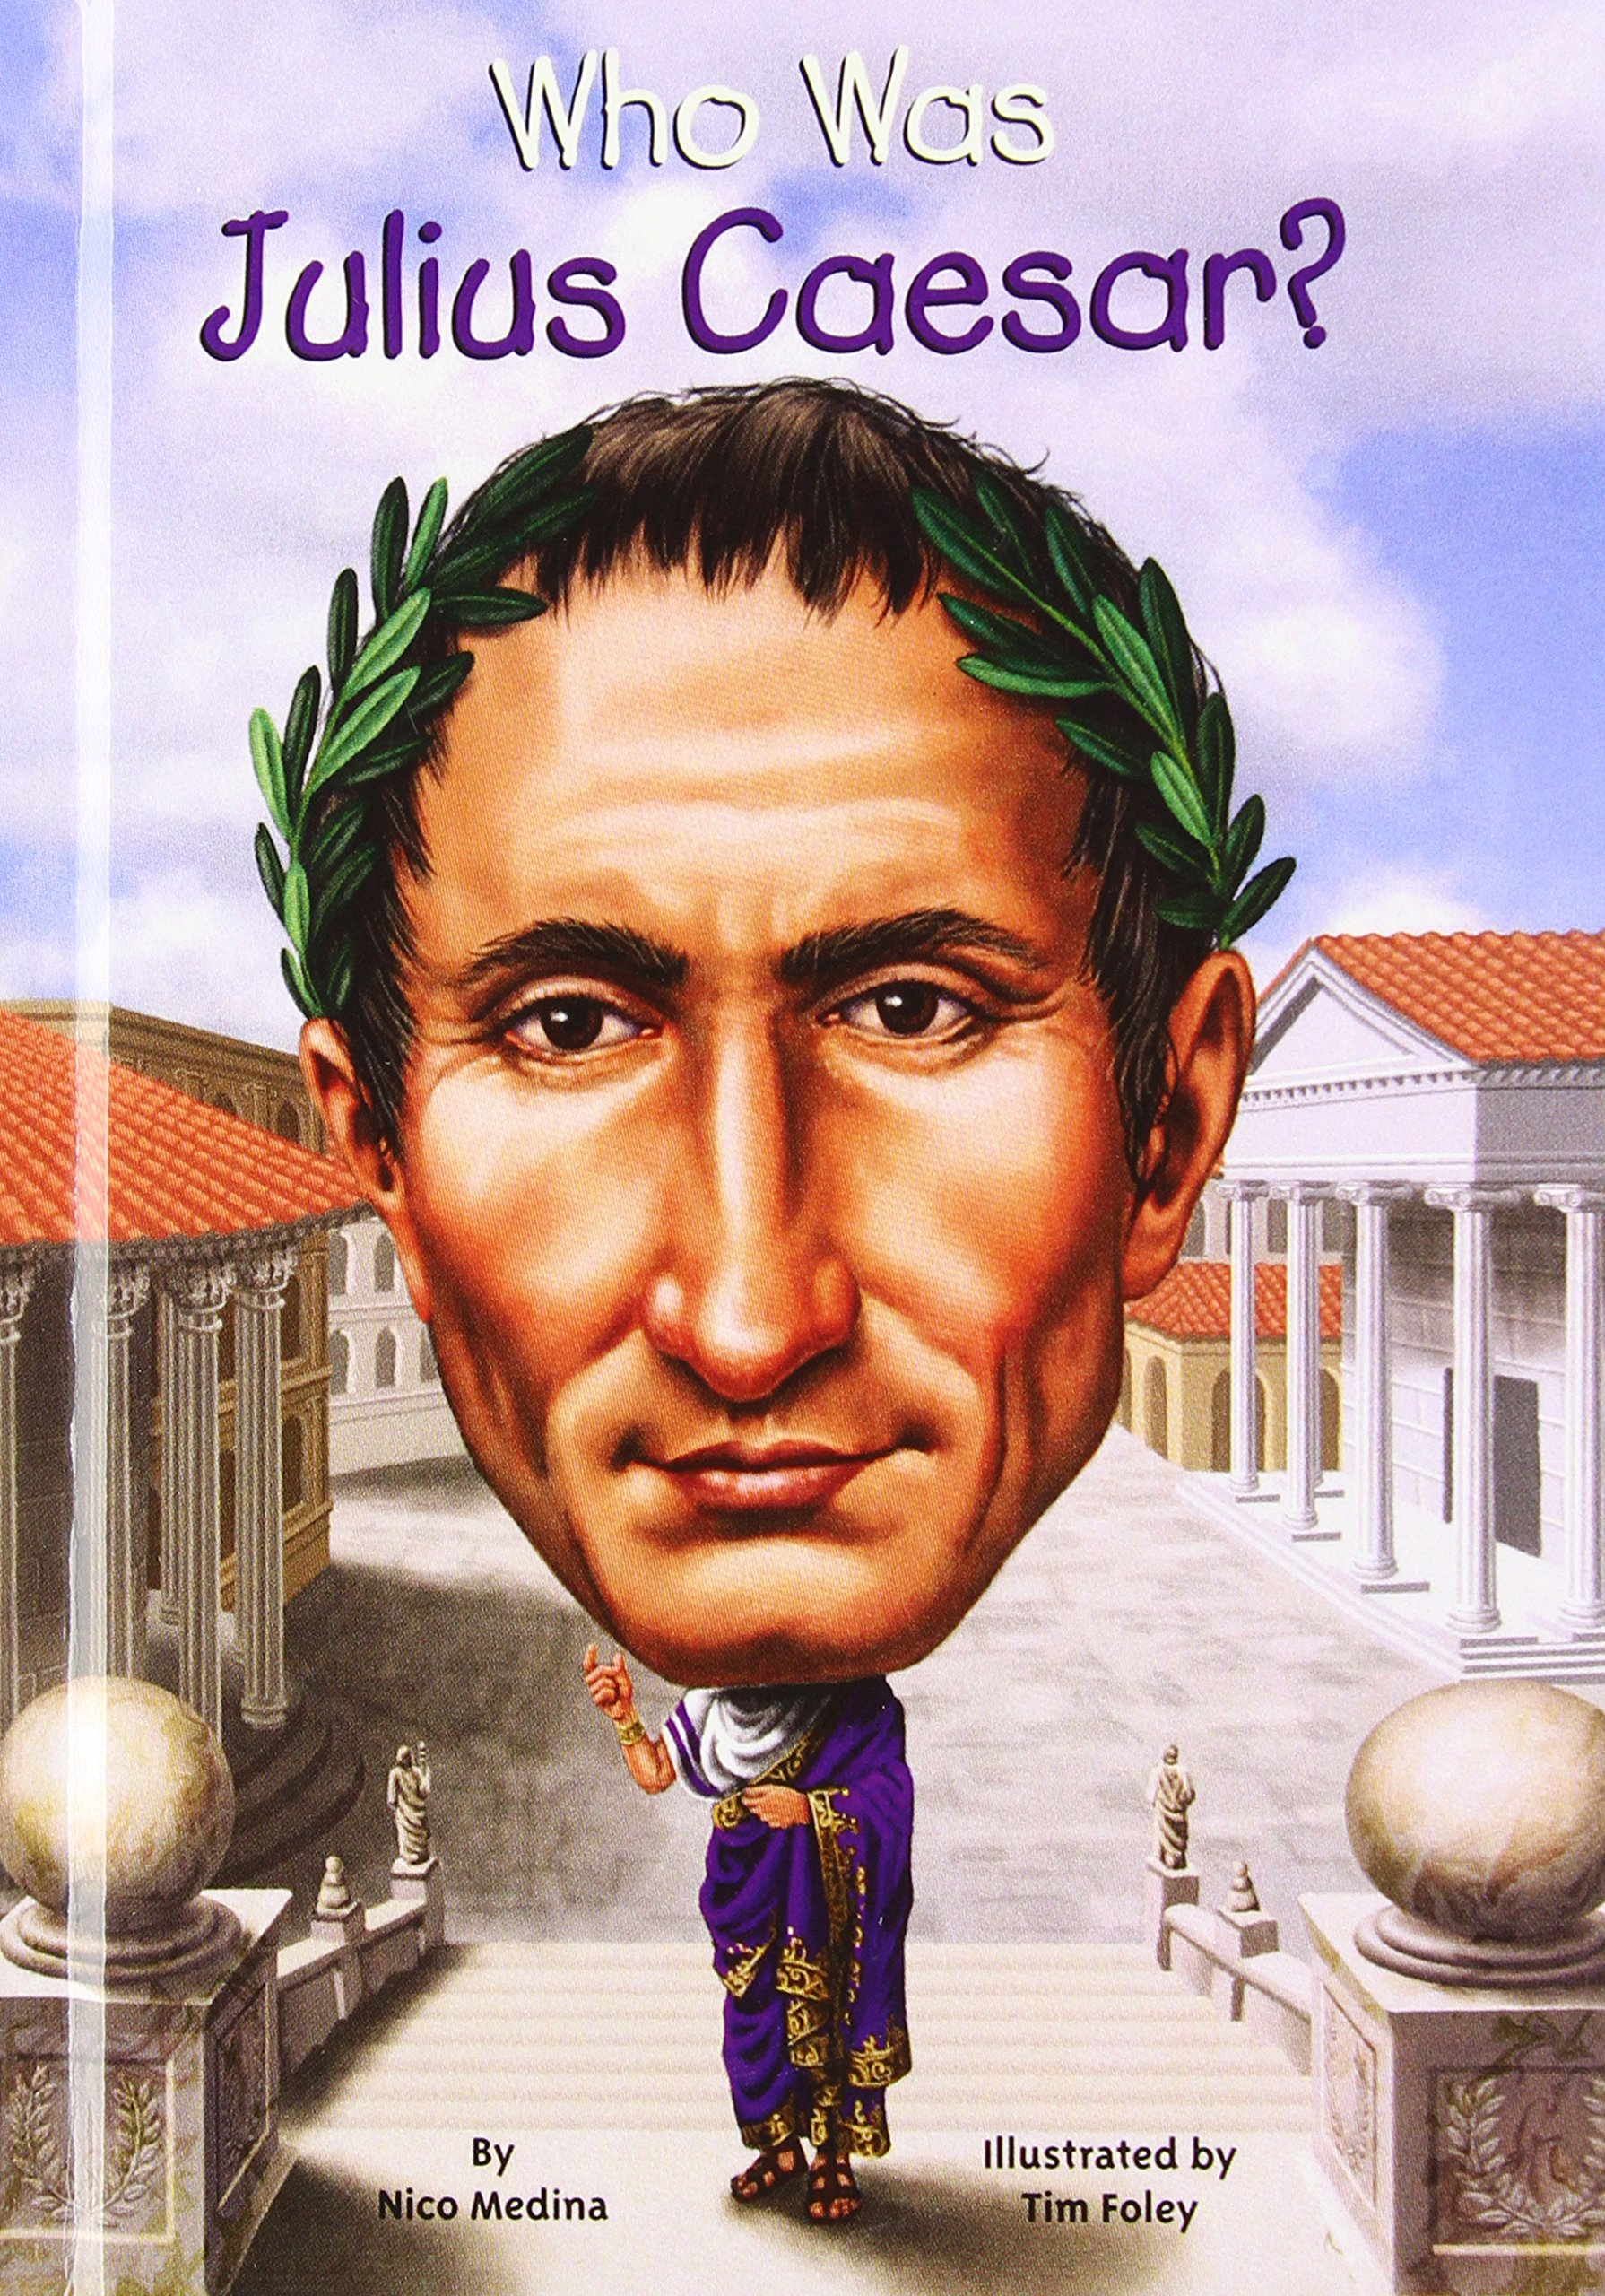 Download Who Was Julius Caesar? (Turtleback School & Library Binding Edition) ebook